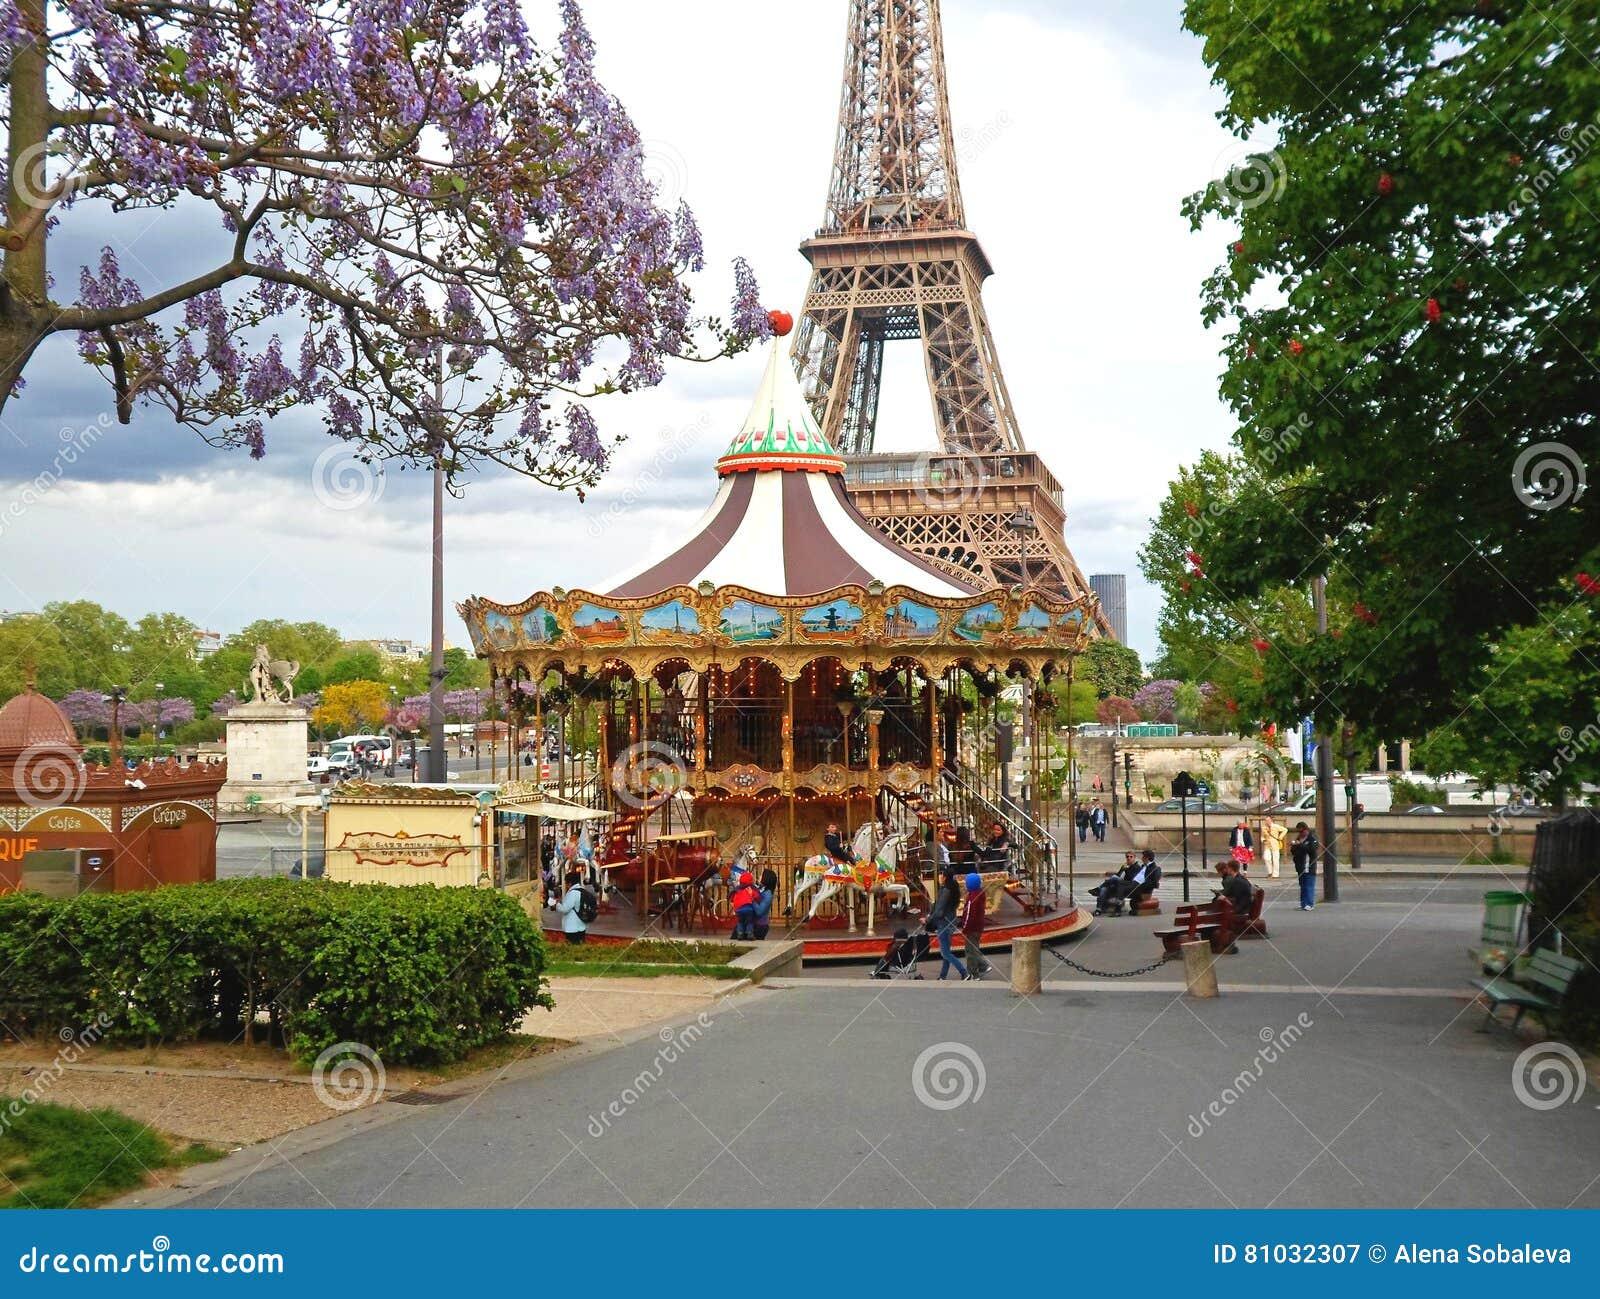 children on carousel in park paris france editorial image 52318434. Black Bedroom Furniture Sets. Home Design Ideas